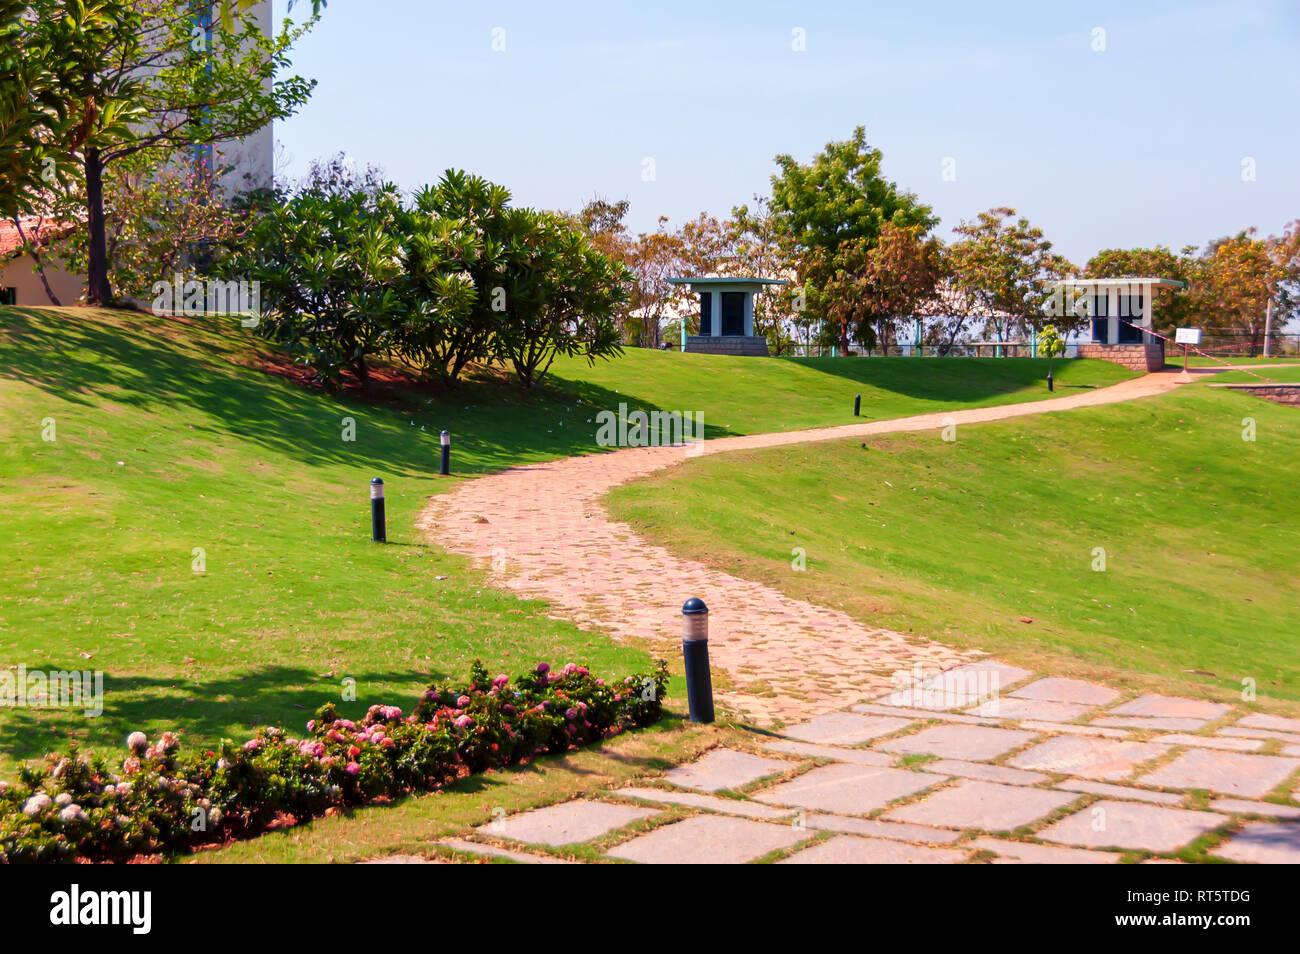 A curved path through a green lawn on a bright sunny day at Golkonda Resorts and Spa at Hyderabad, Telangana, India. - Stock Image